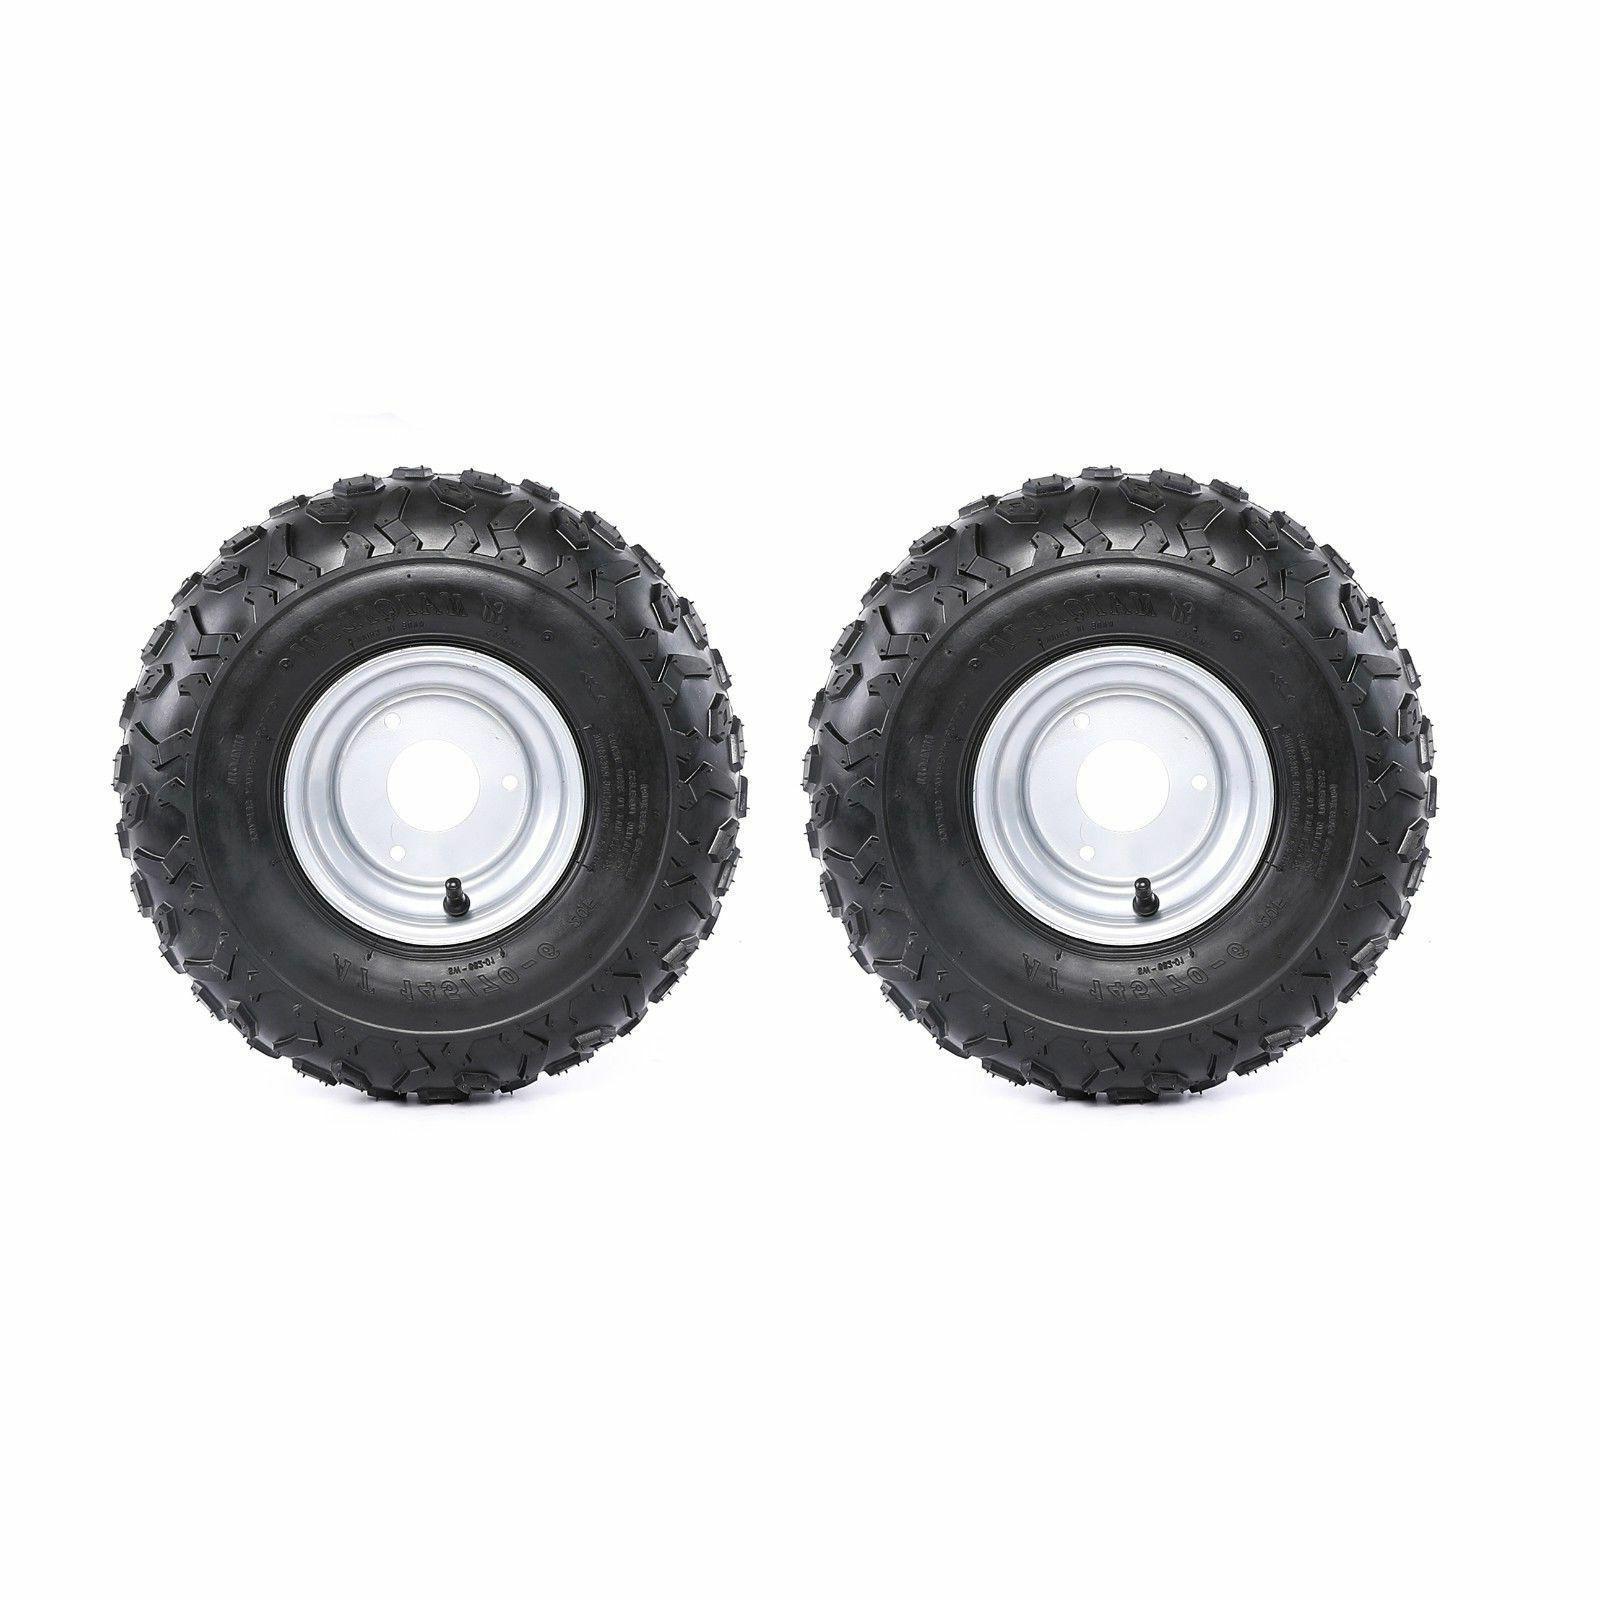 2pc 145 70 6 wheel tire rim